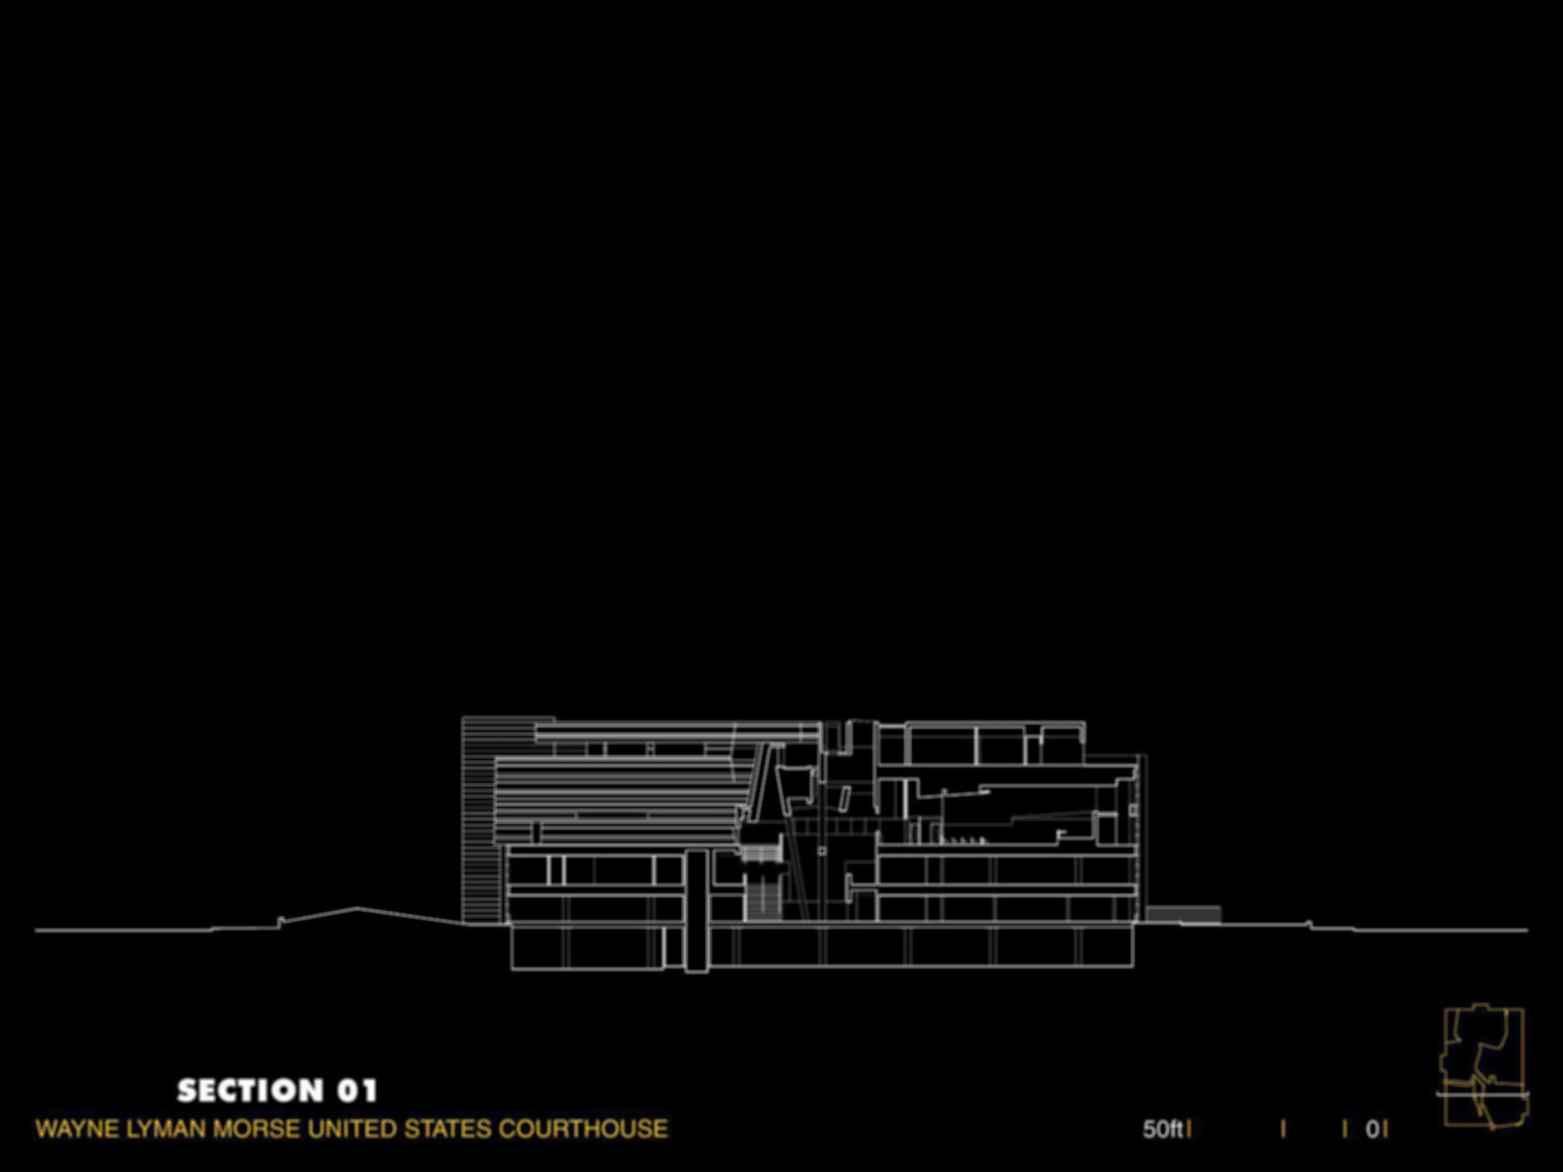 Wayne L. Morse United States Courthouse - Concept Design